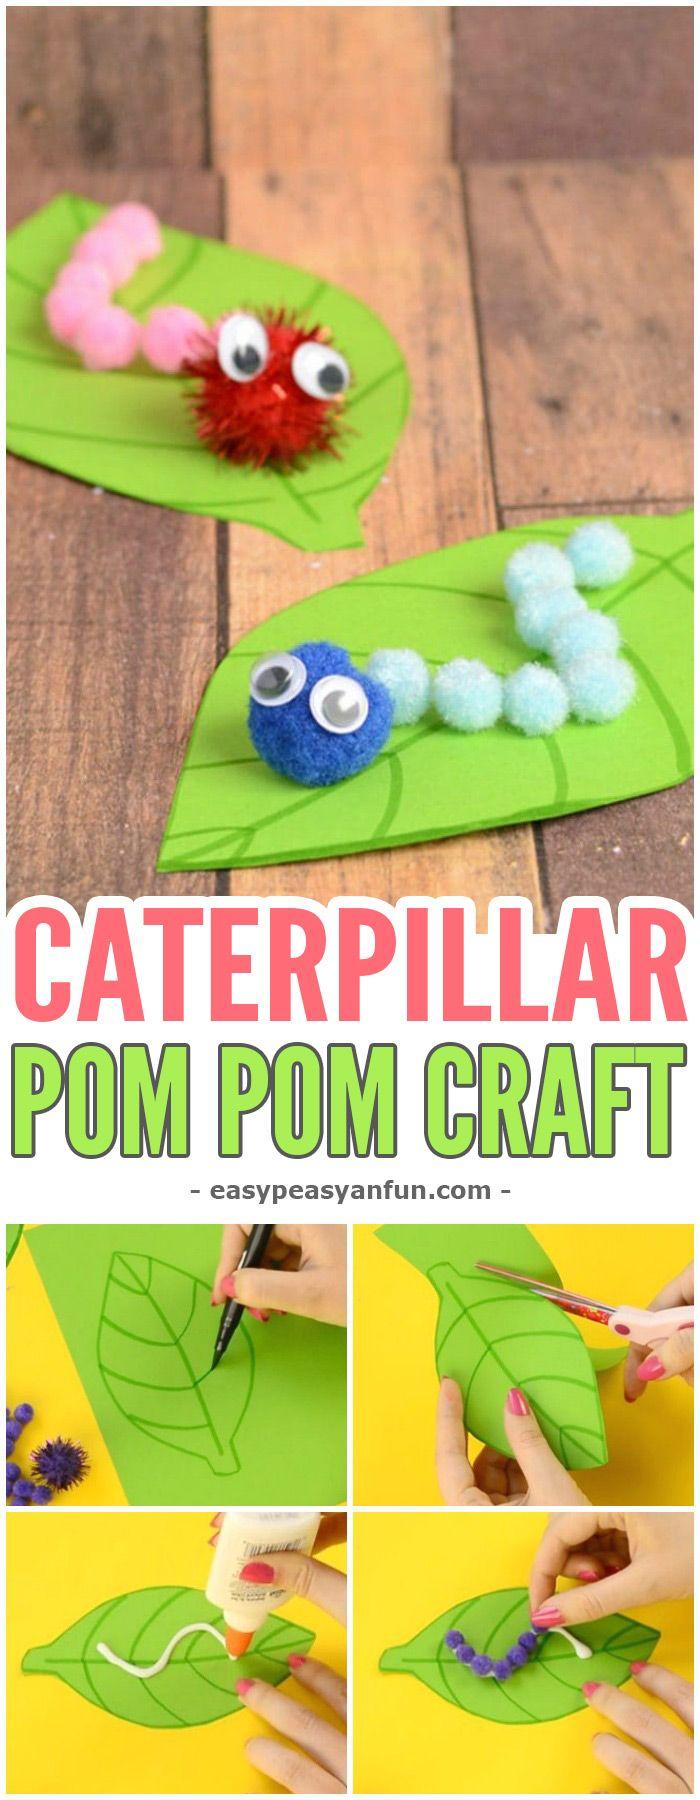 DIY Craft: Caterpillar Pom Pom Craft - Spring Craft Ideas 1